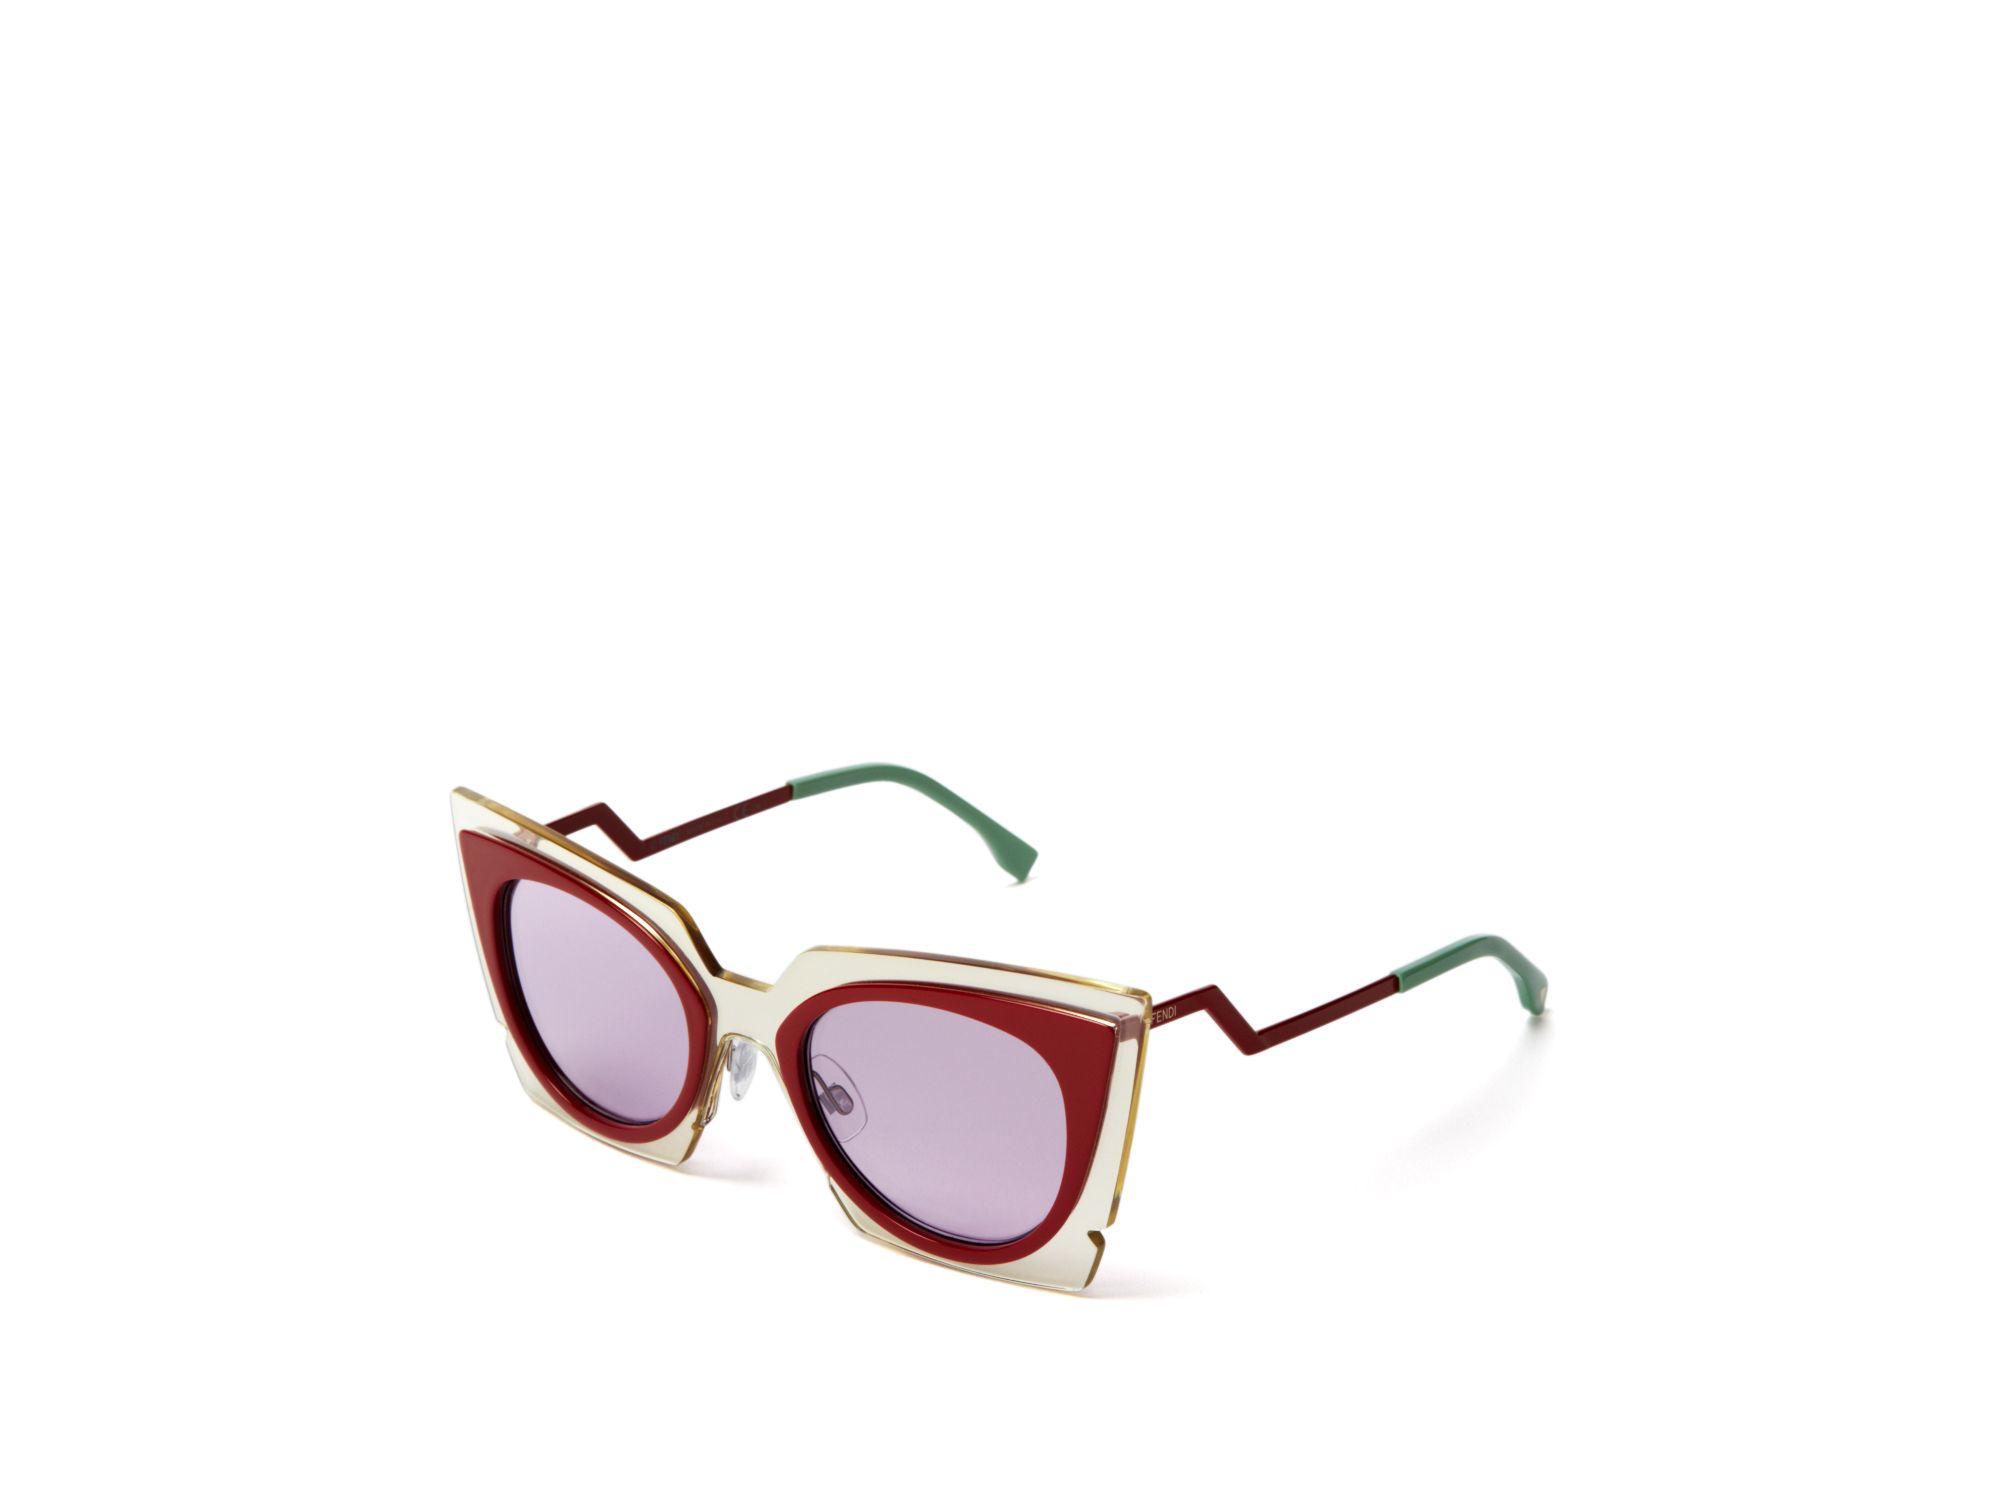 70e465ce18 49mm Eye Lyst Sunglasses Cat Oversized In Fendi Red 4qxn8X7